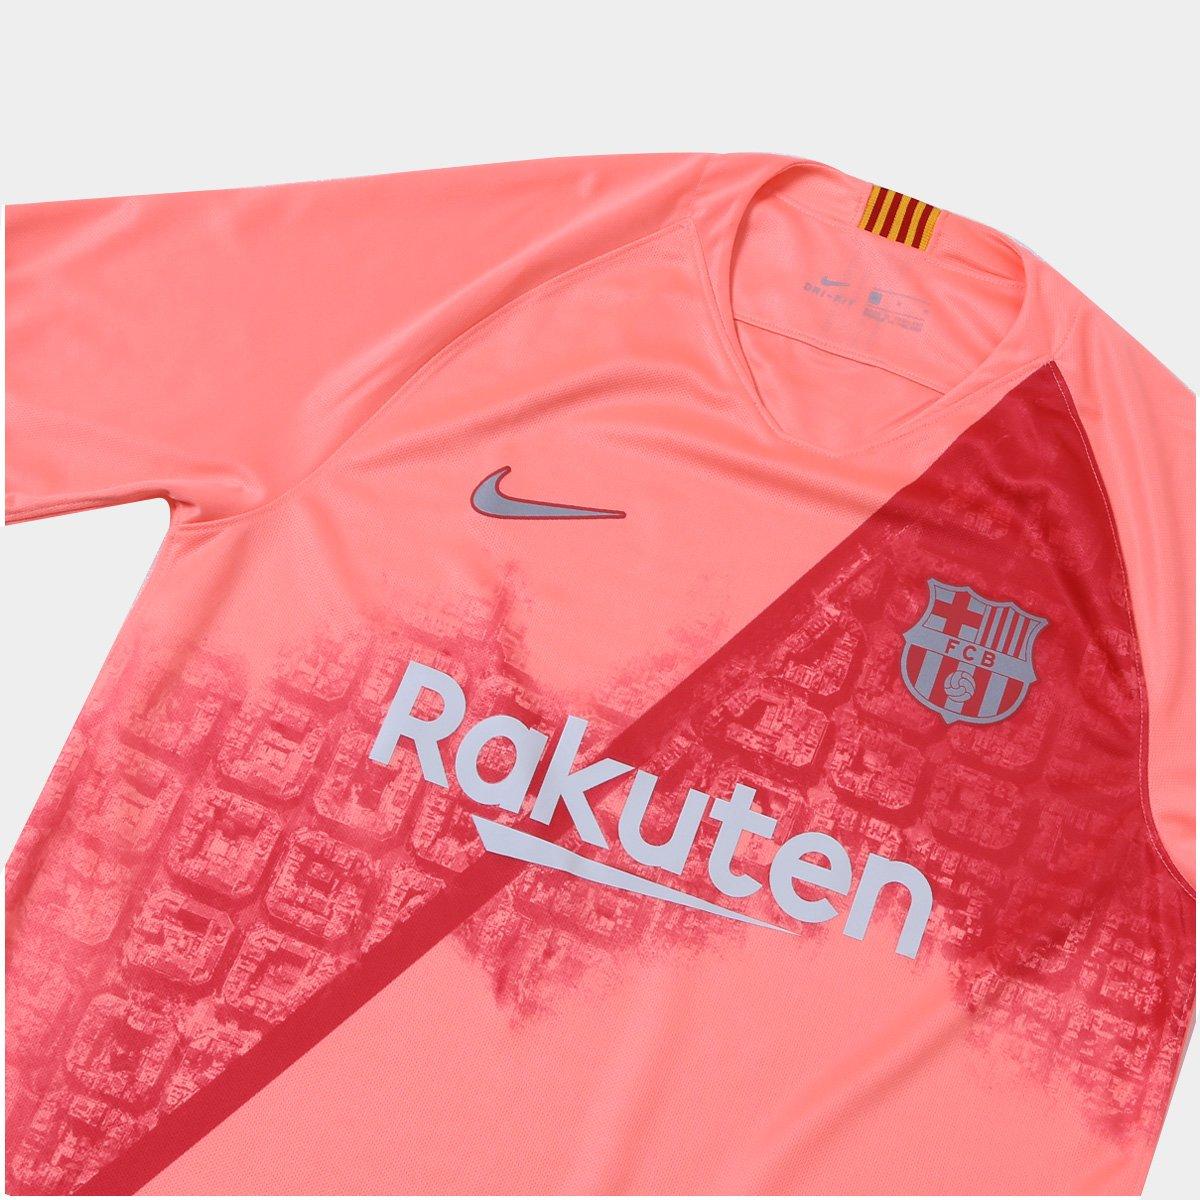 Camisa Barcelona Third 2018 s nº - Torcedor Nike Masculina - Salmão ... c33a5cedf4474